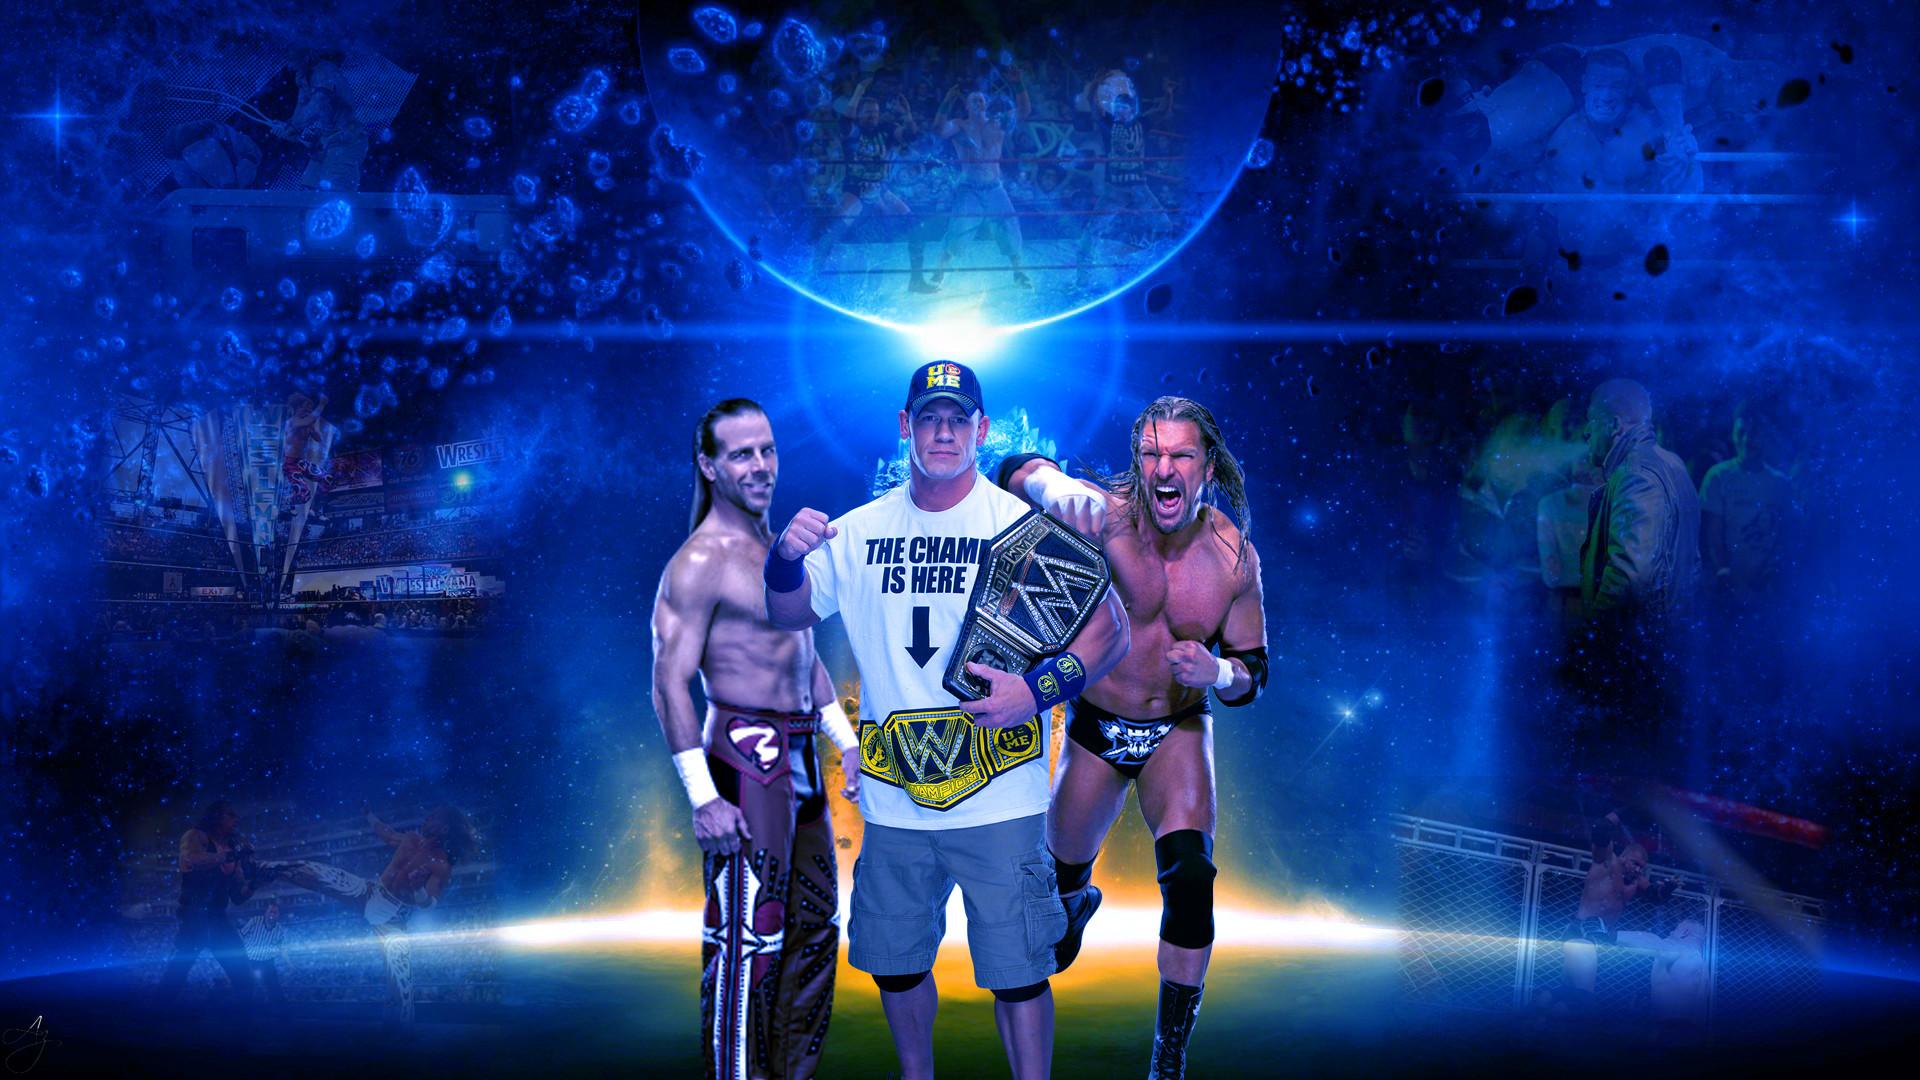 Triple H And John Cena Friends Wallpaper By Funkyali